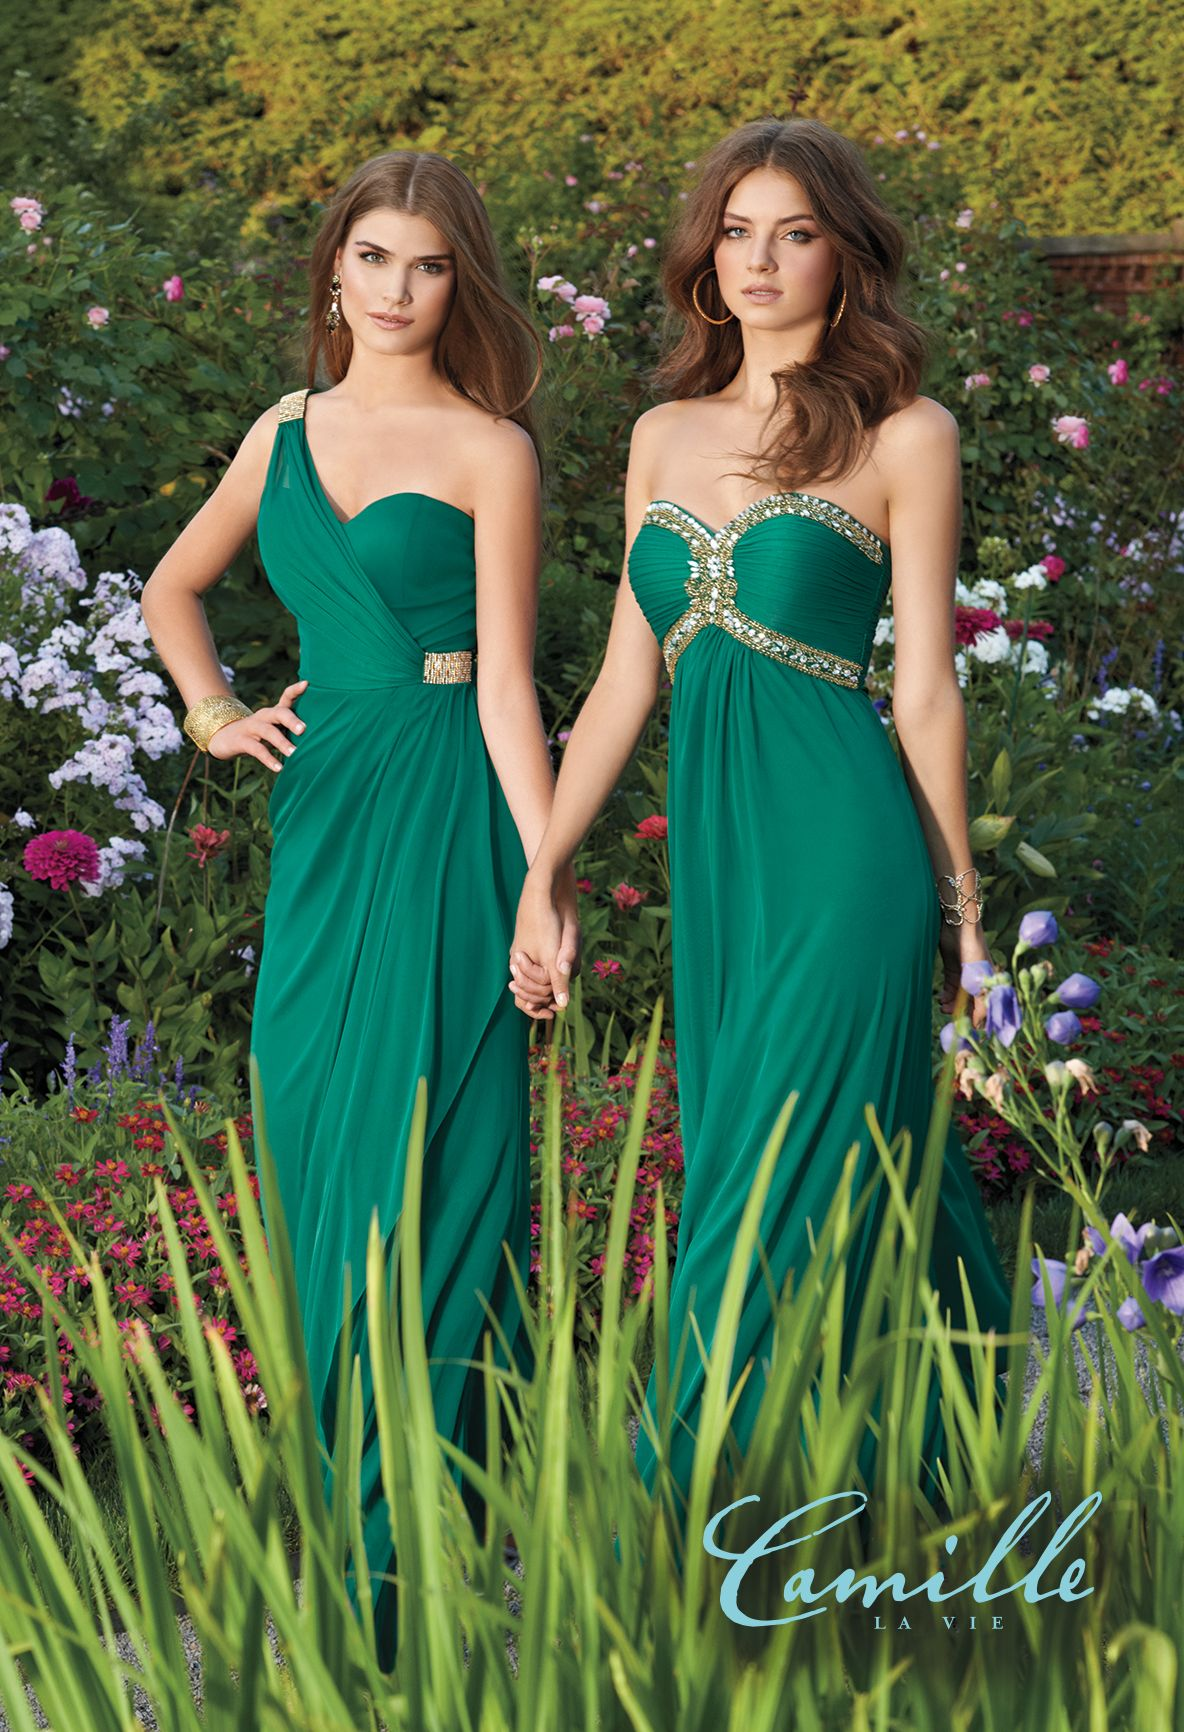 Green bridesmaid long dresses camille la vie wedding dresses green bridesmaid long dresses camille la vie ombrellifo Images